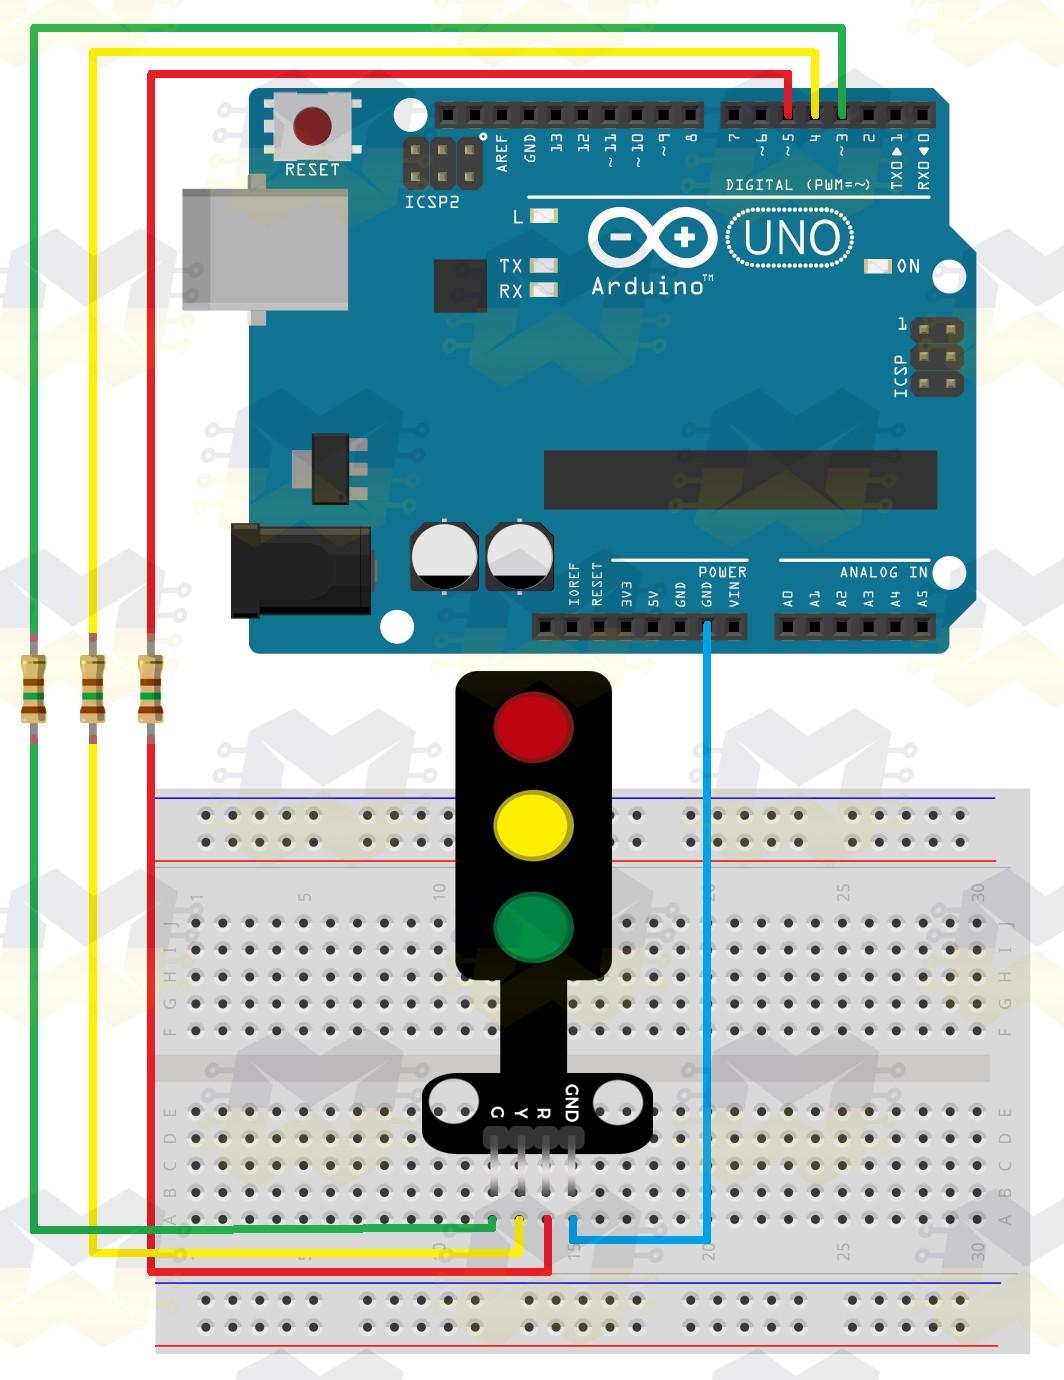 img01_como_usar_com_arduino_modulo_led_8mm_tipo_semaforo_uno_mega_2560_nano_leonardo